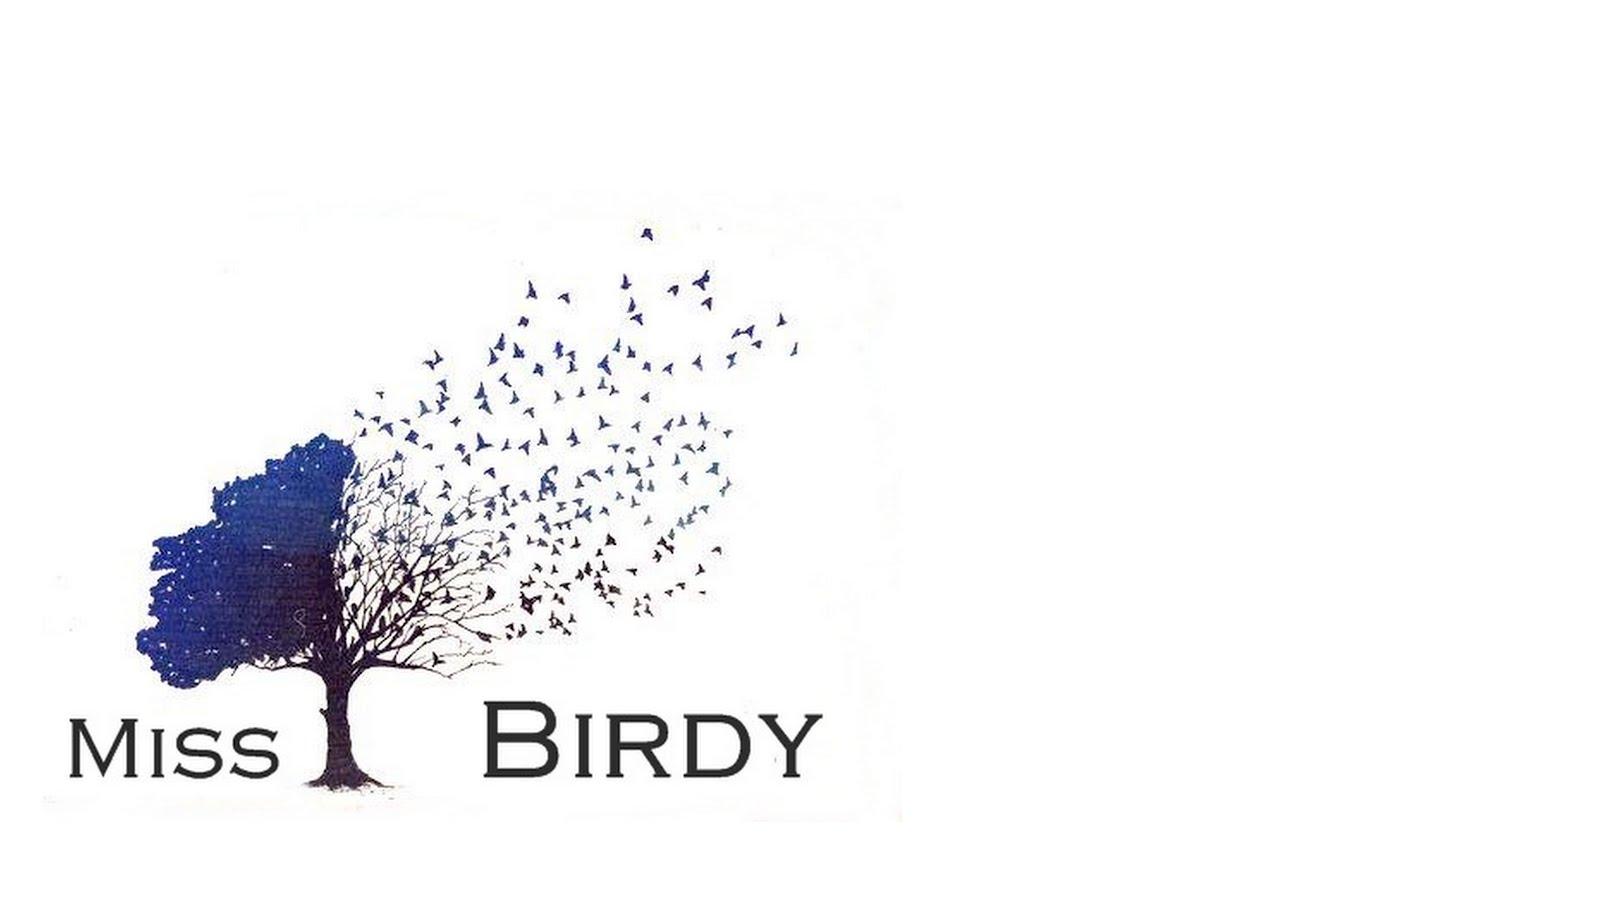 Miss Birdy